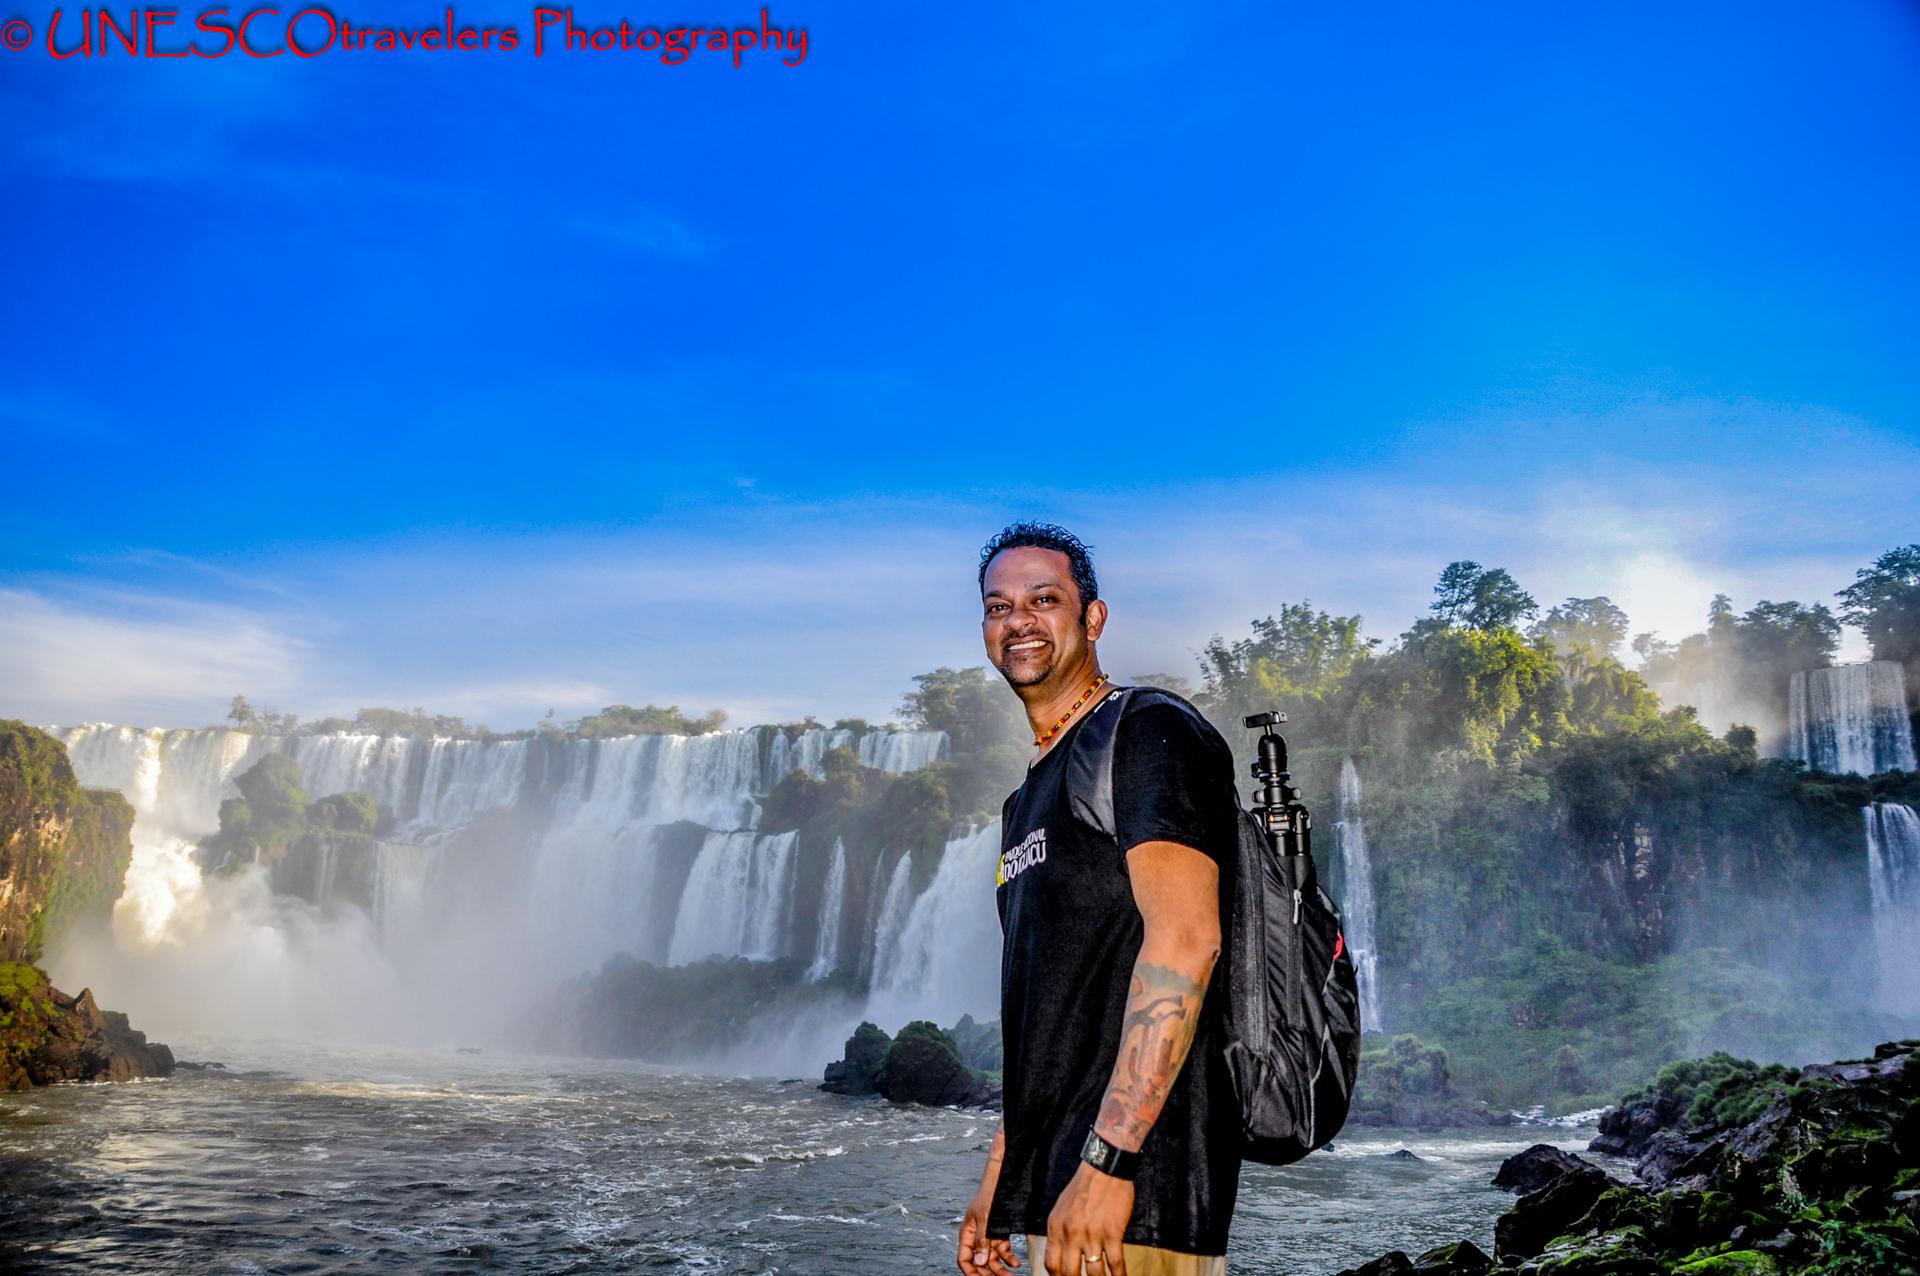 The Falls of Iguazu @ Puerto Iguazu, Argentina Iguazu National Park - Argentina By UNESCOtravelers